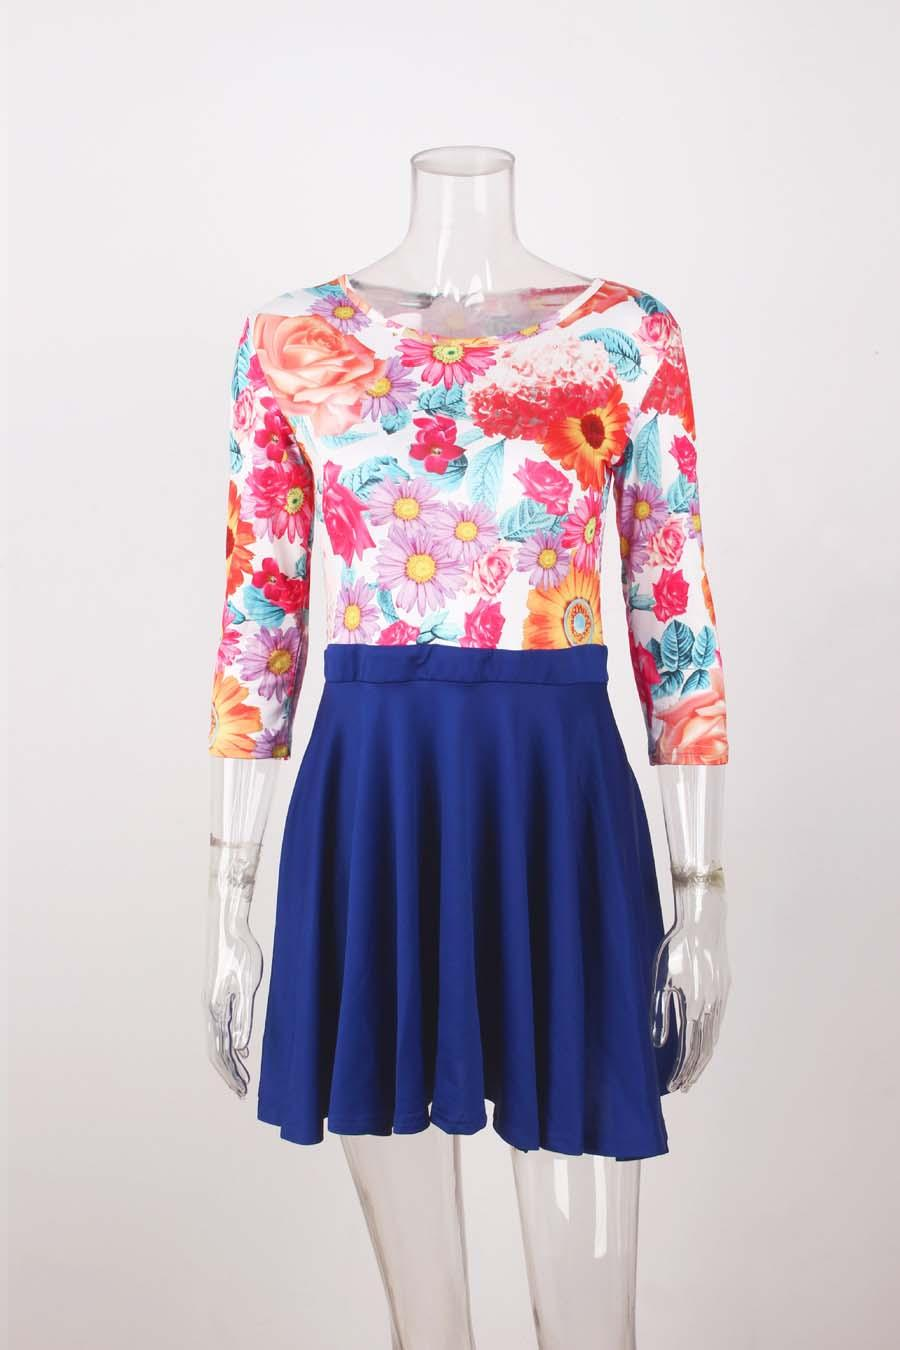 Women Flower Floral Print 3/4 Sleeve Skirt Dress Ladies Evening Party Mini Swing Skater Dress